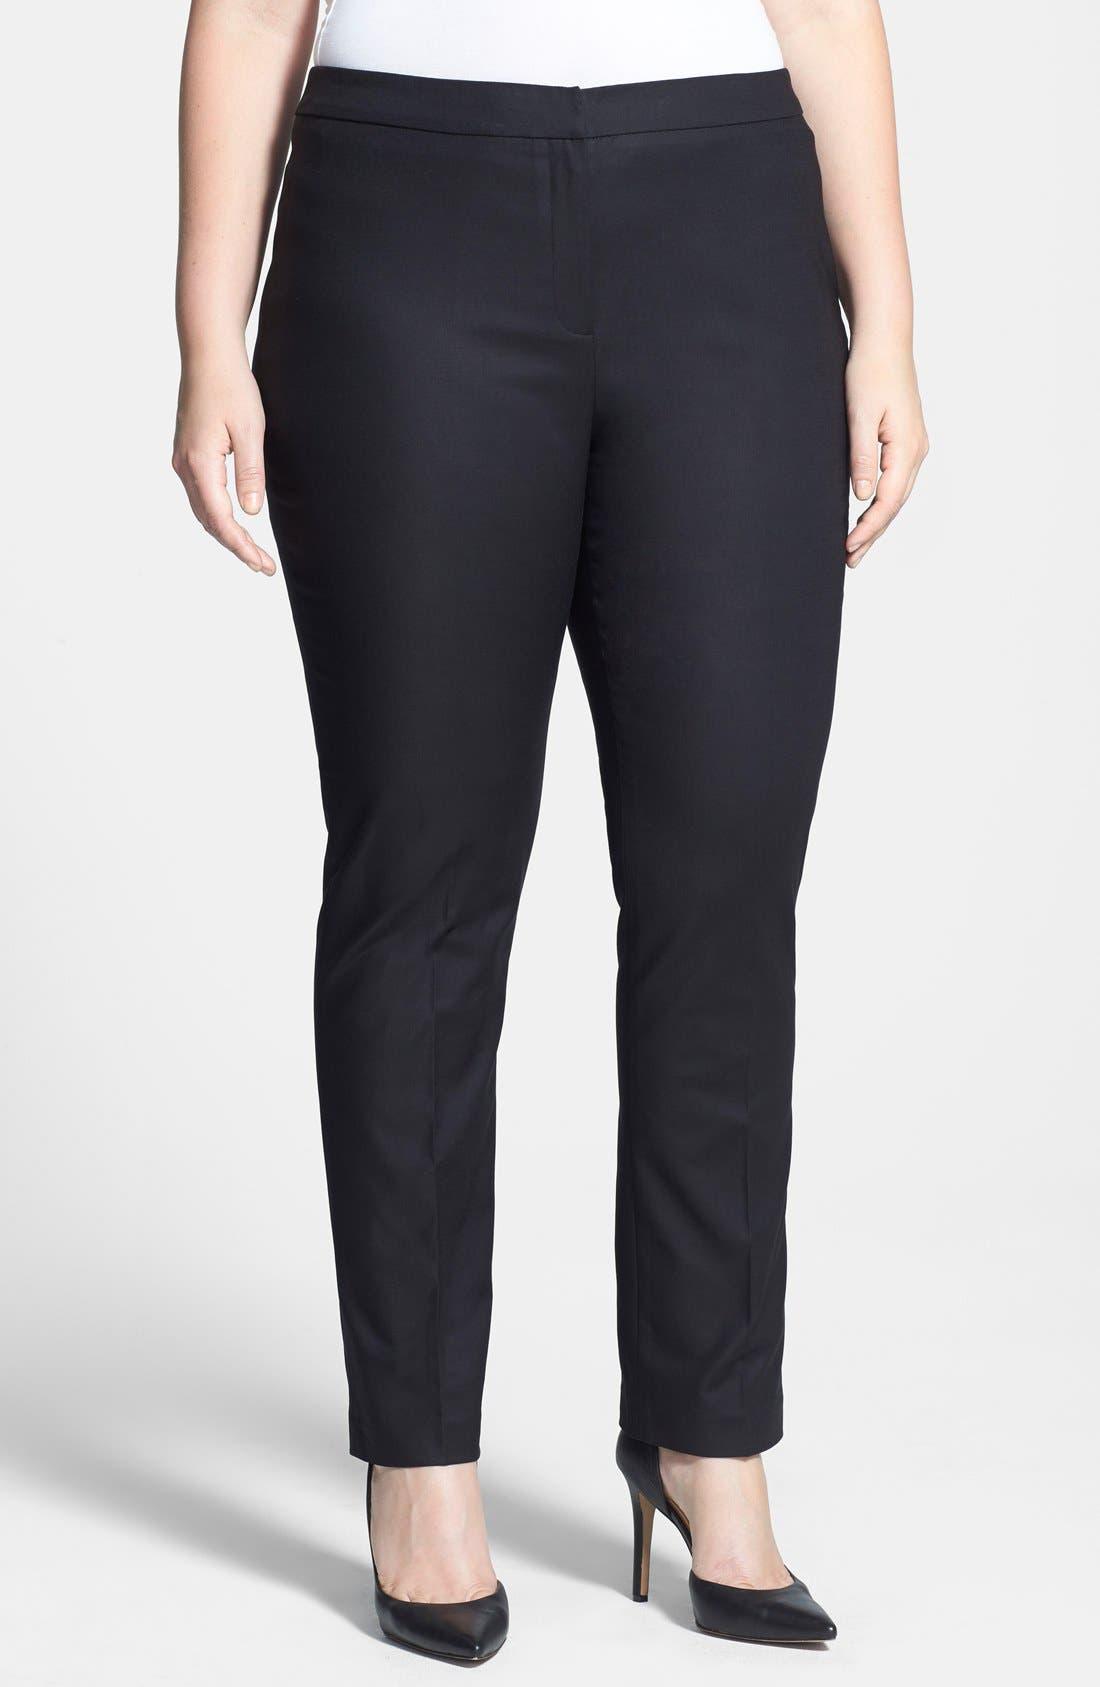 NIC+ZOE 'The Perfect' Pants (Plus Size)